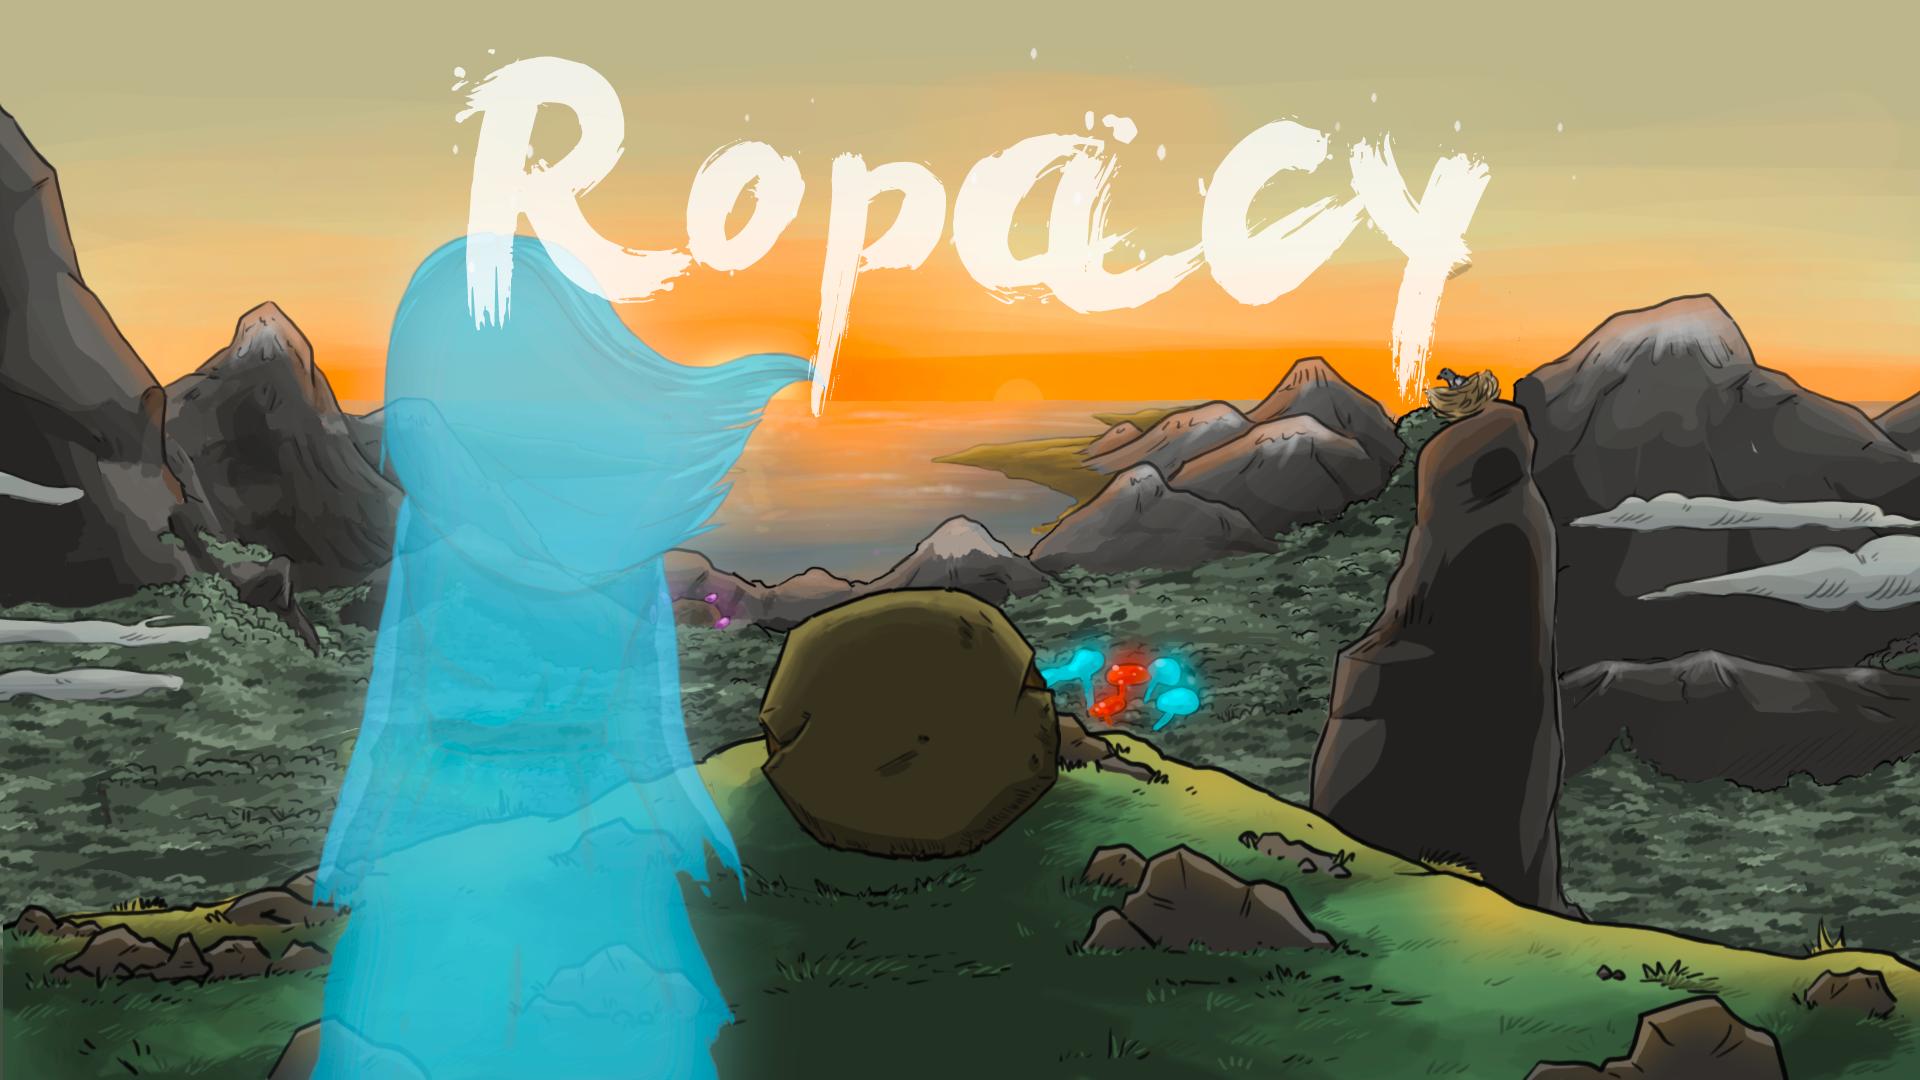 Ropacy